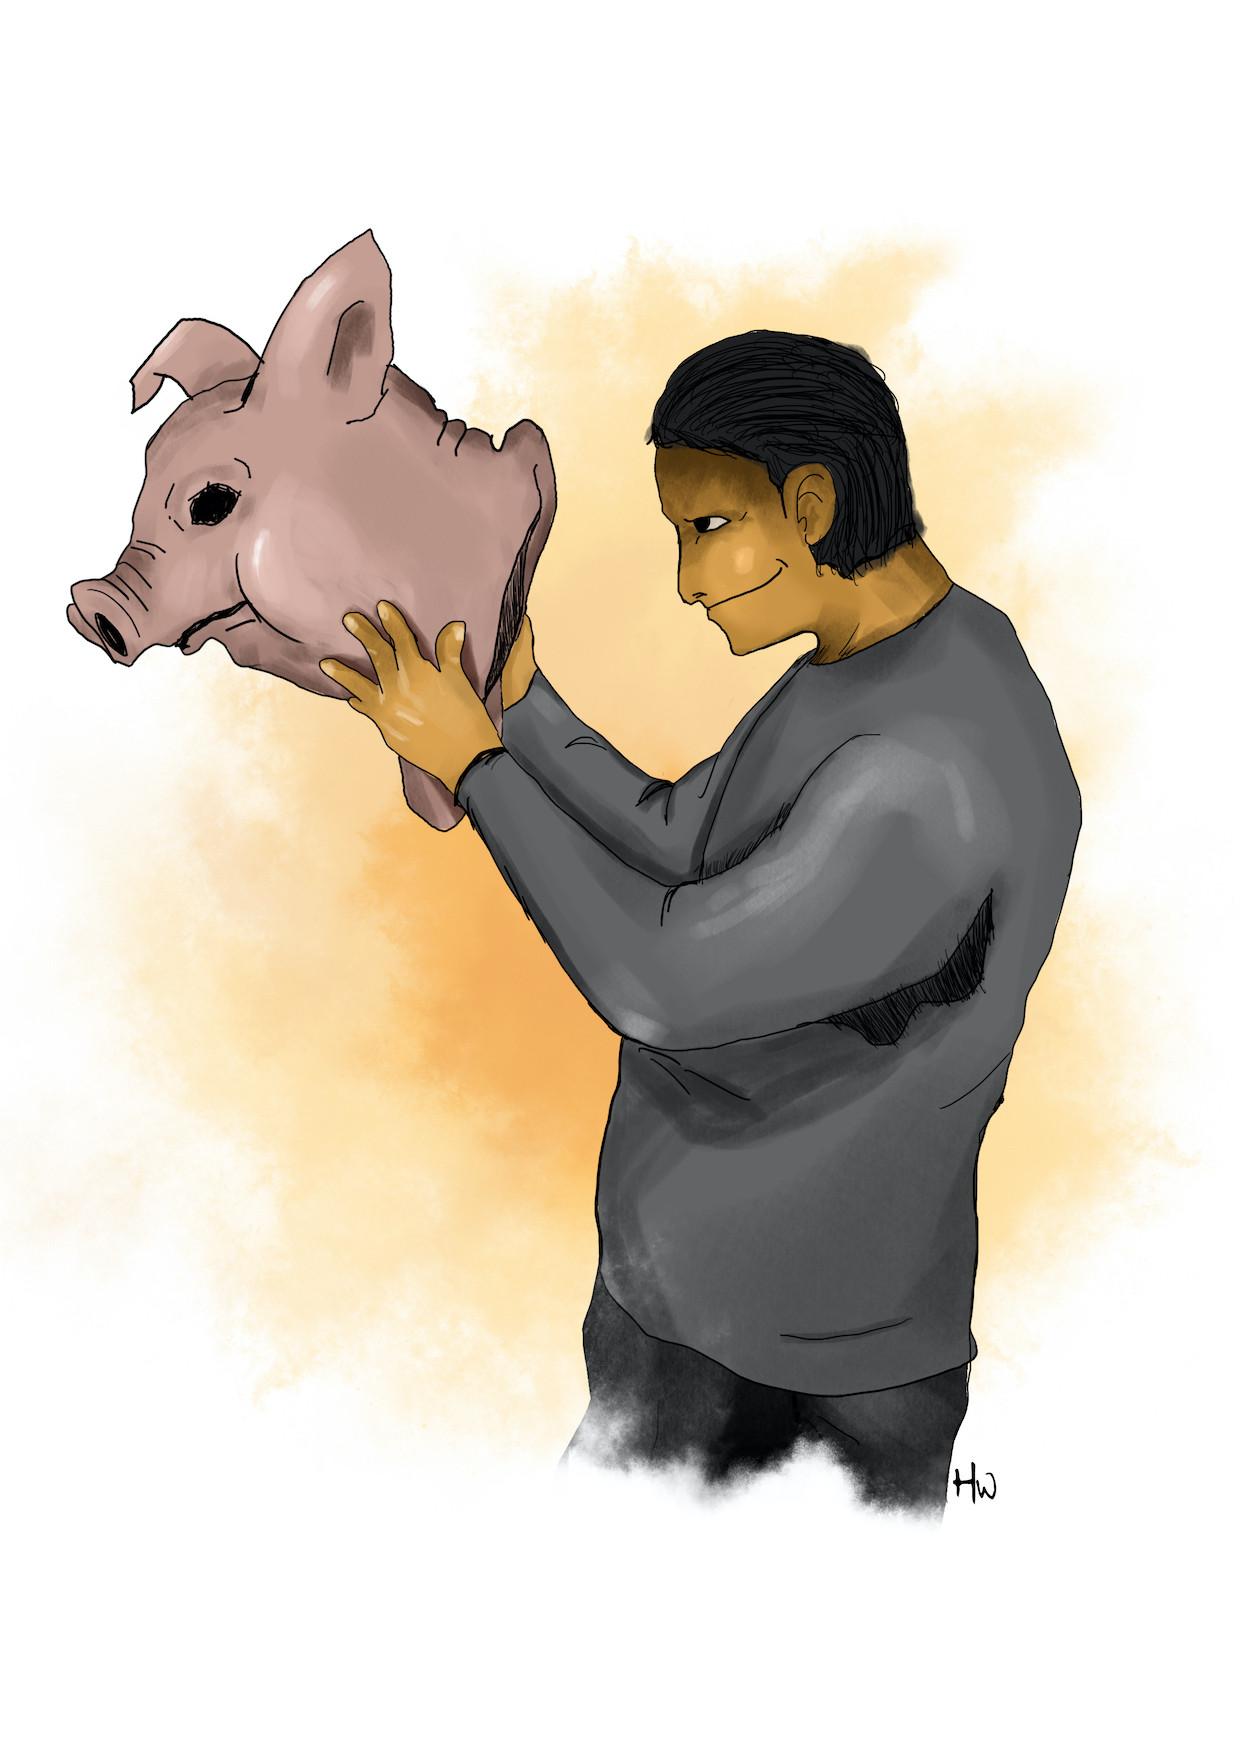 The boar demon hunt that shook the internet